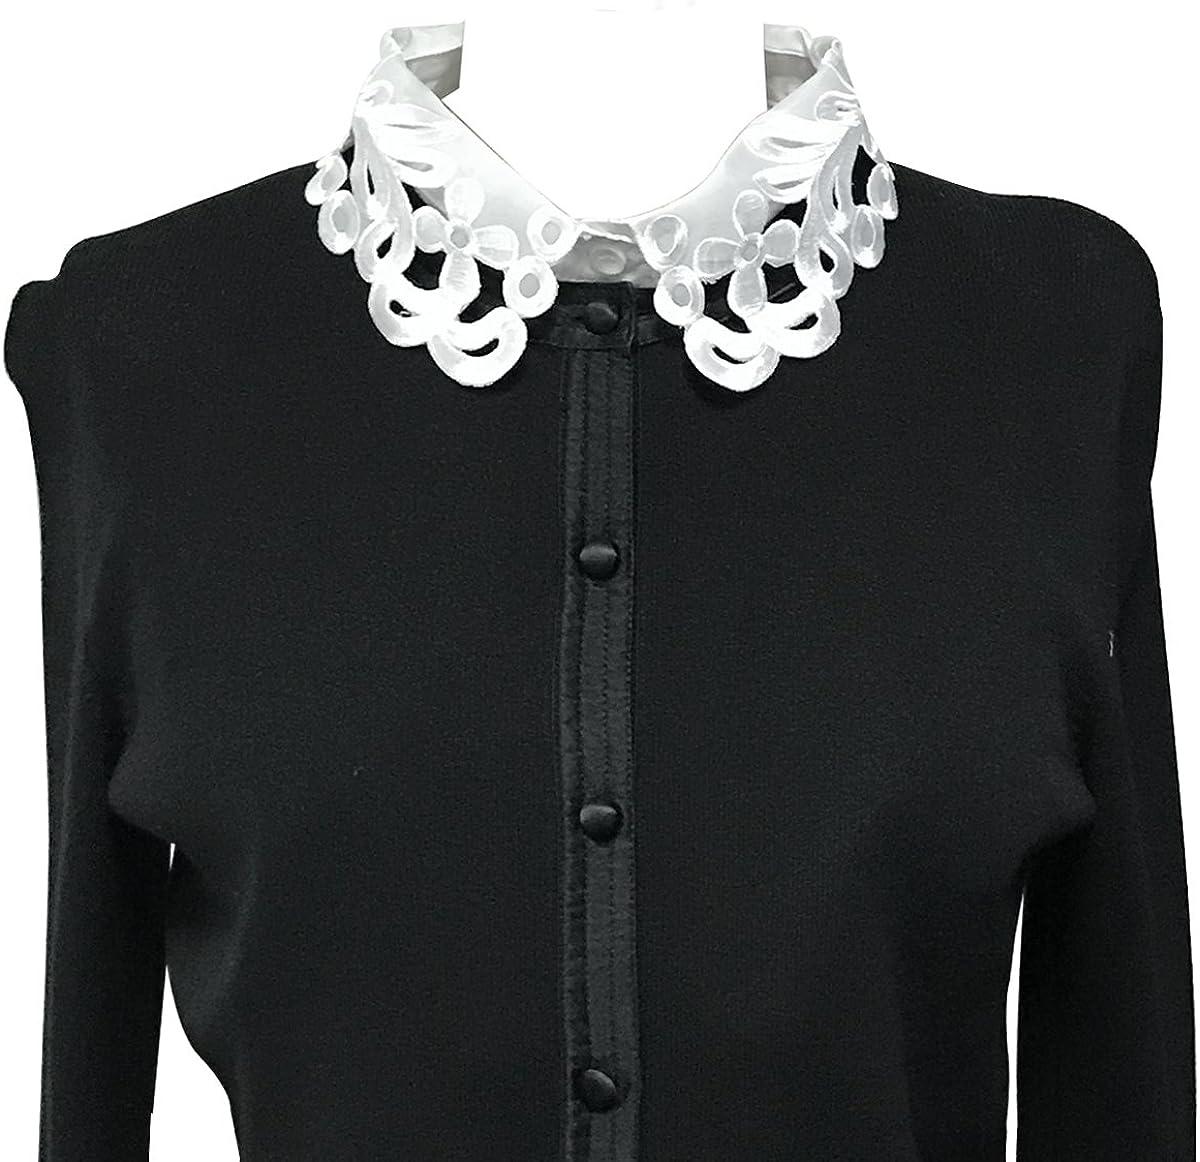 Wrapables Daisy Doily Lace Collar Half Shirt